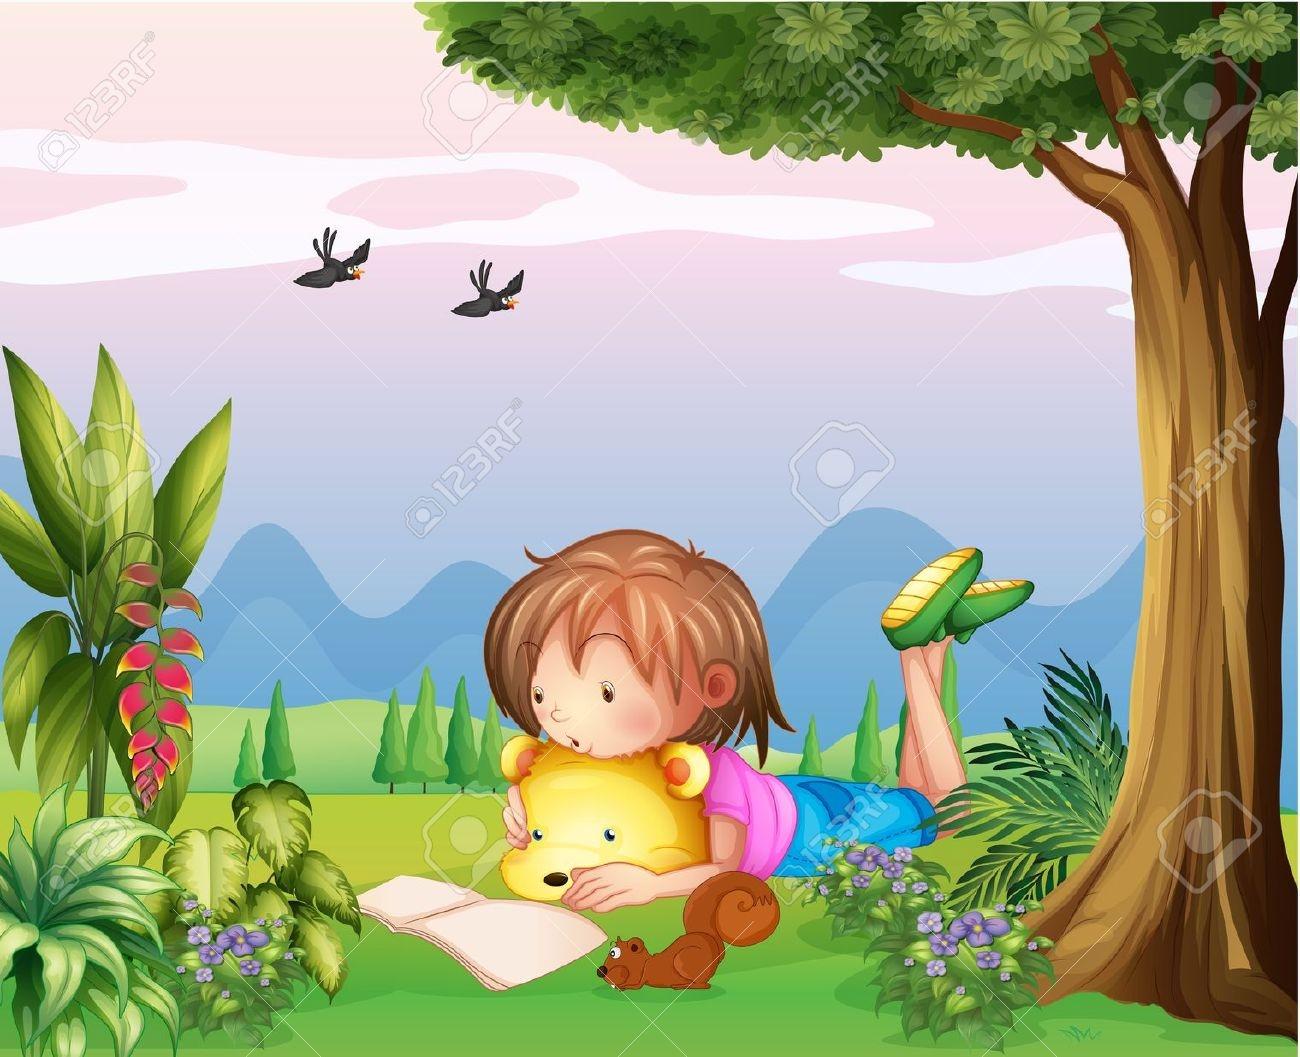 Illustration Kids Reading Under Tree Stock-Vektorgrafik (Lizenzfrei)  111744728